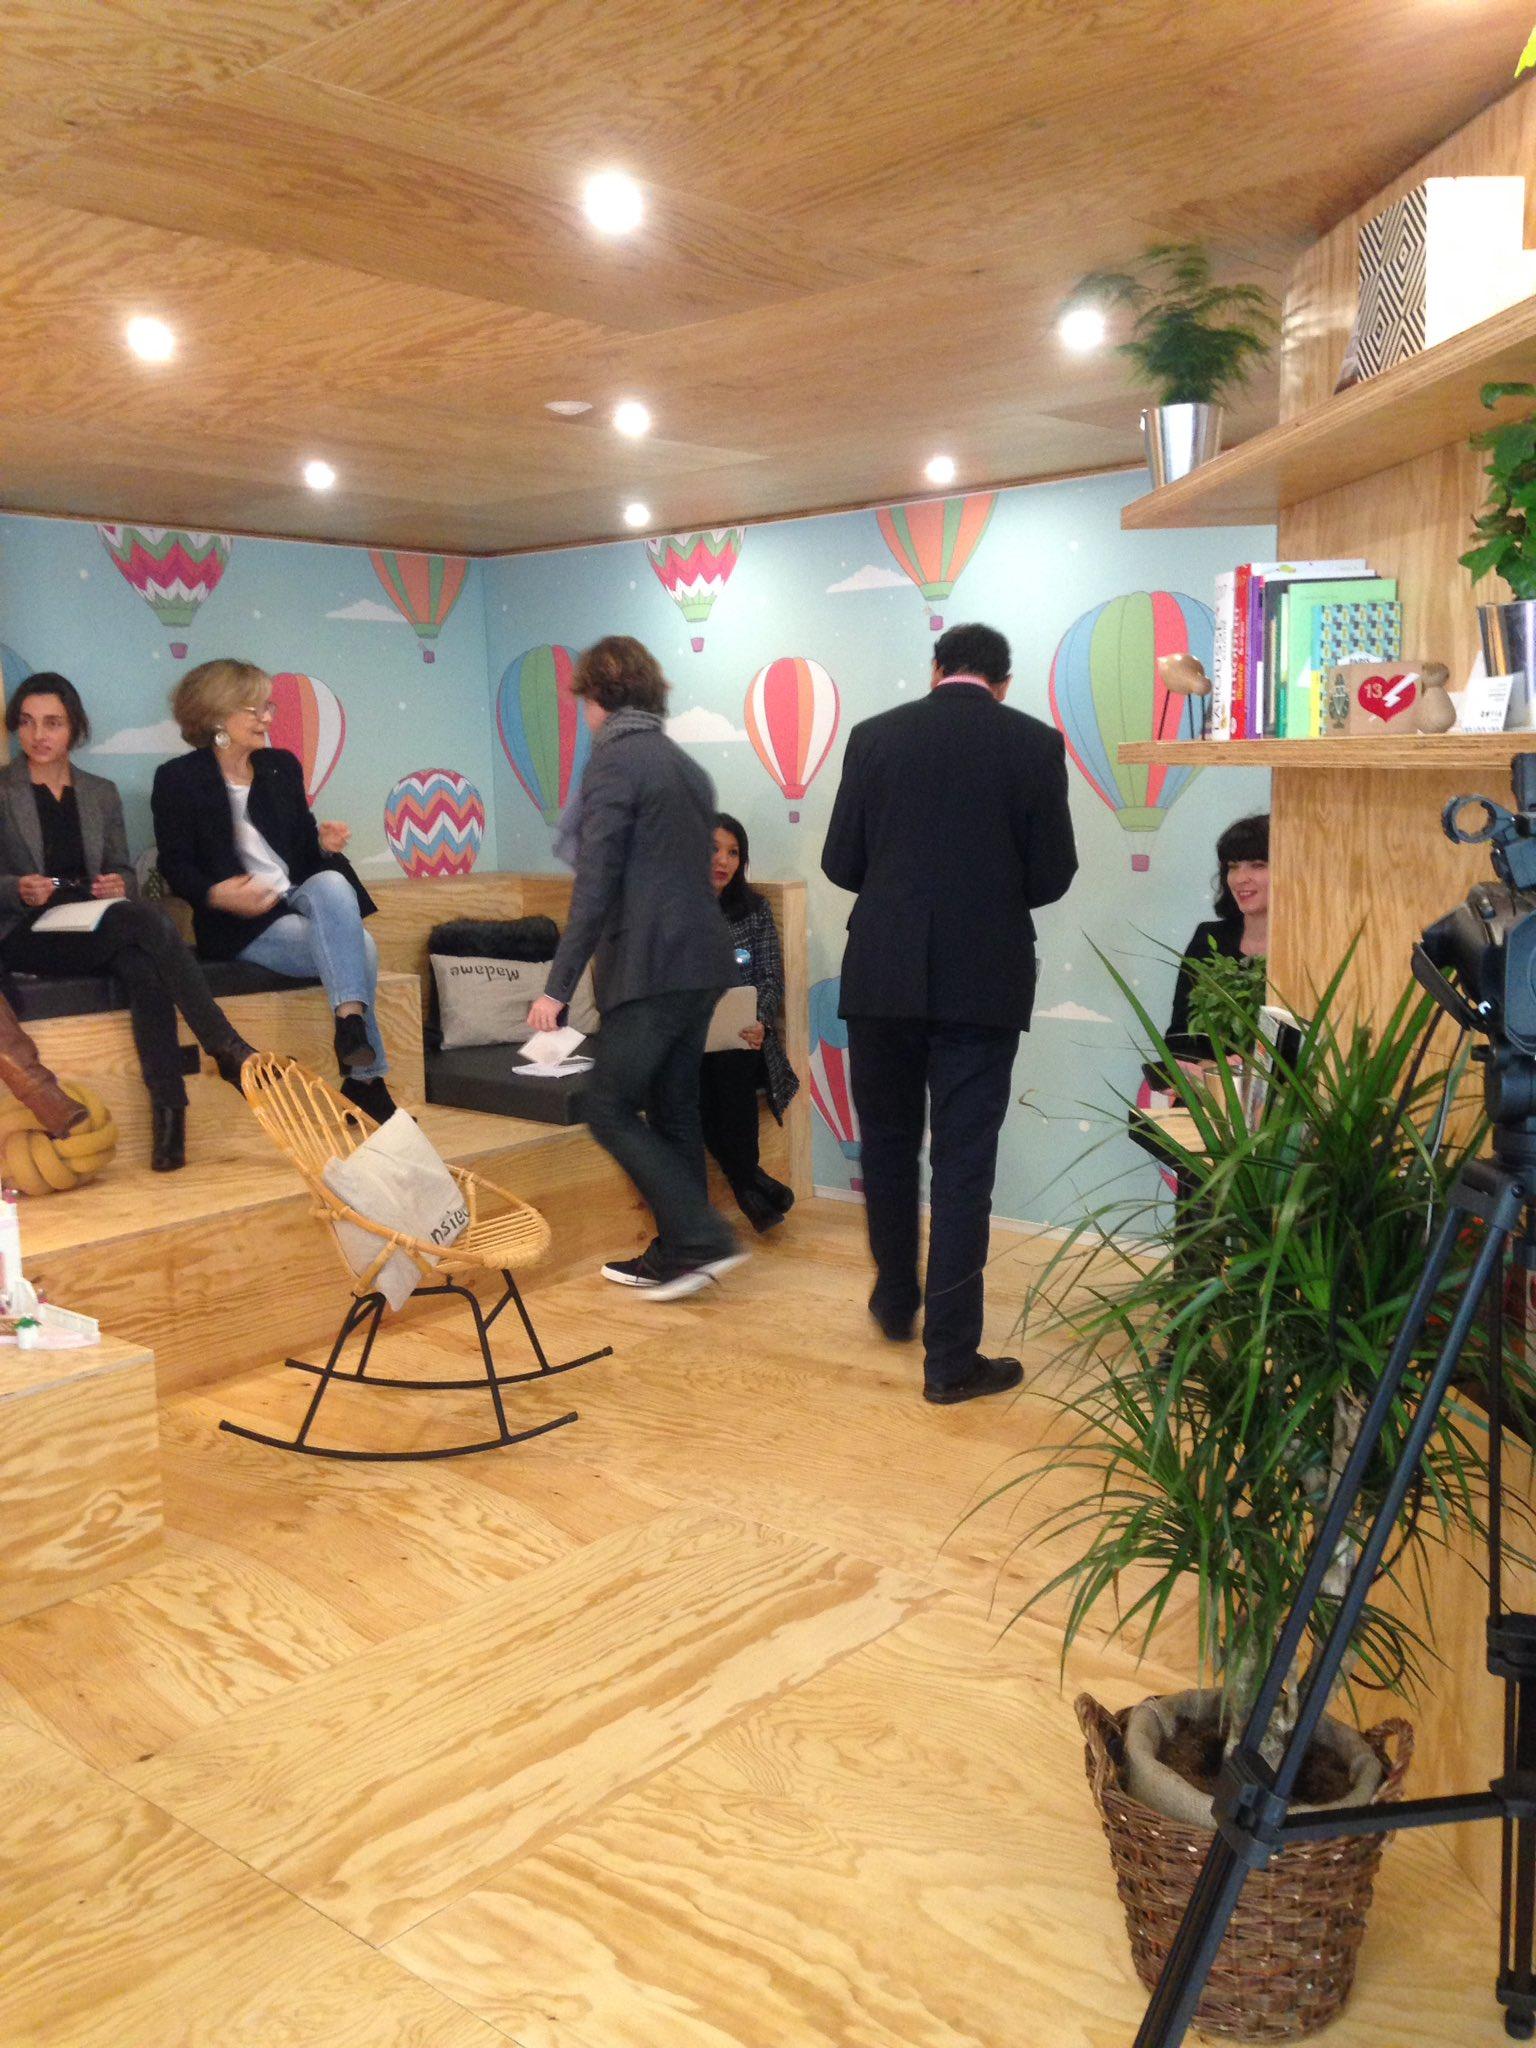 bouygues immobilier on twitter pr sent l 39 inauguration de nextdoor fr issyvillage. Black Bedroom Furniture Sets. Home Design Ideas